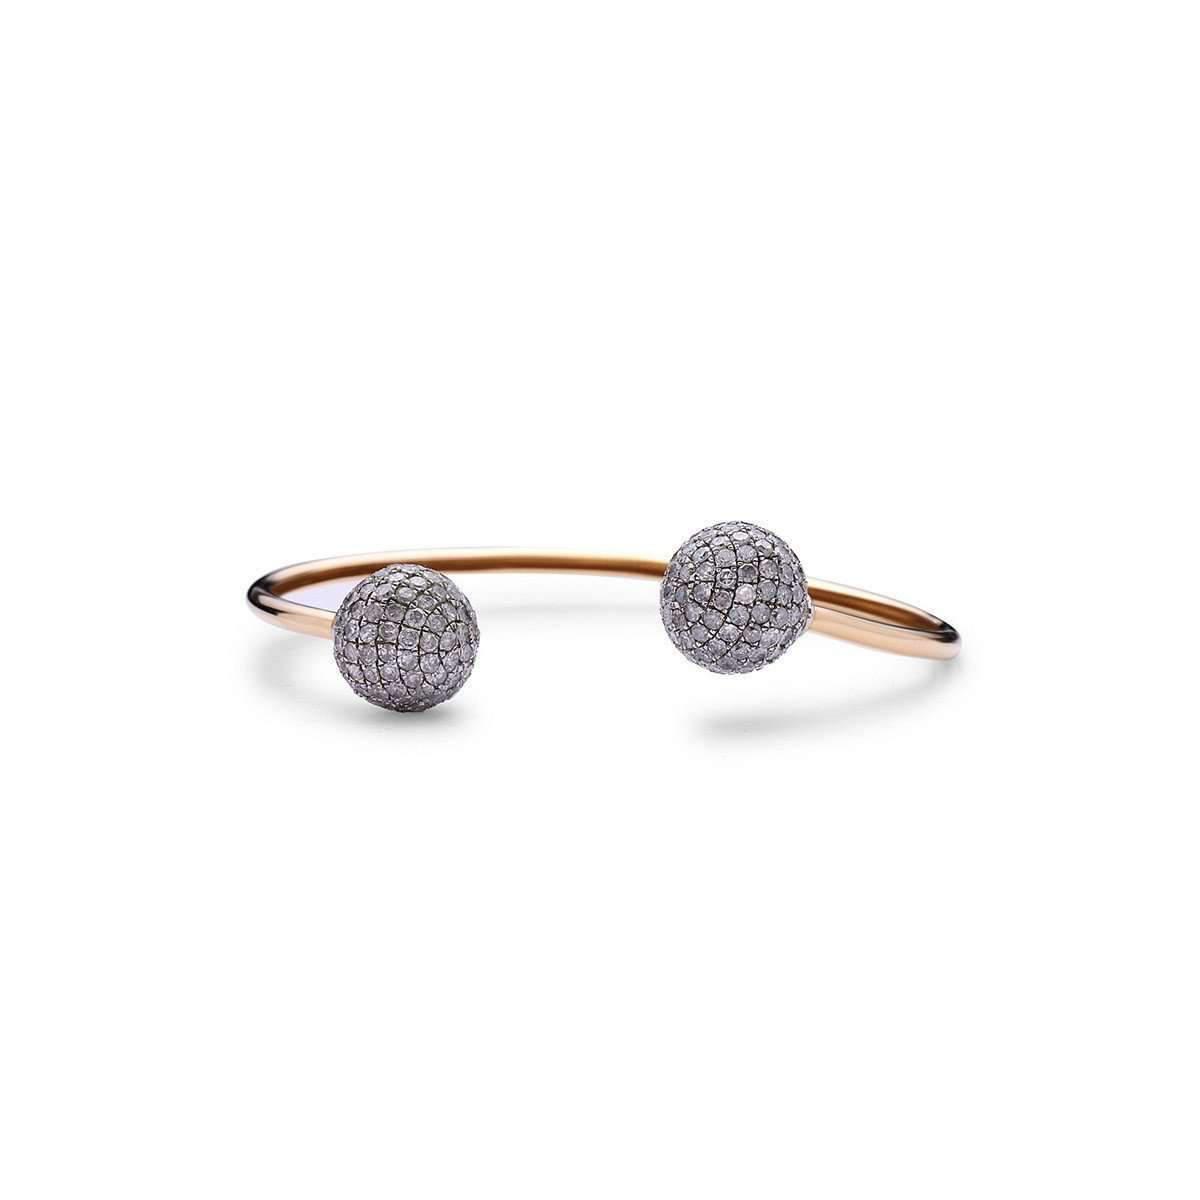 Socheec Spherical Open-ended Diamond Bangle Necklace 5BX9qr